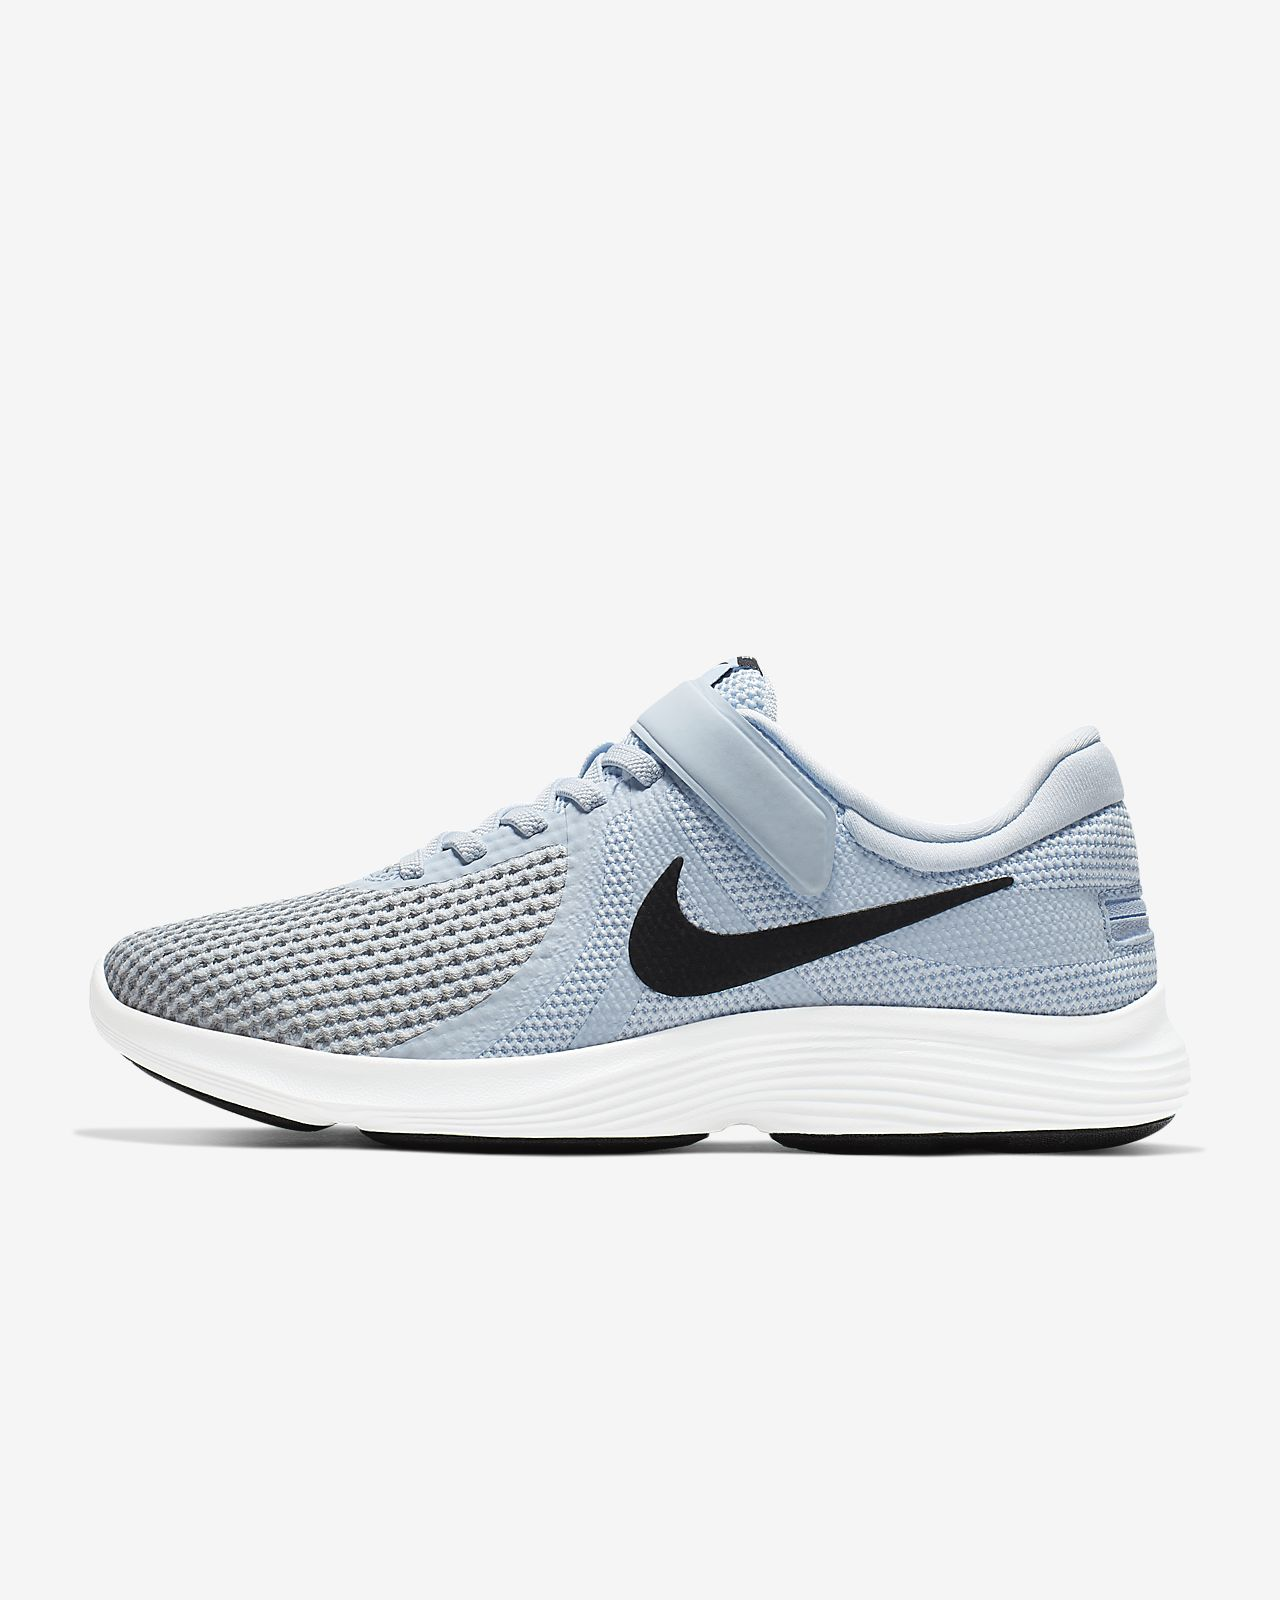 Sapatilhas de running Nike Revolution 4 FlyEase para mulher